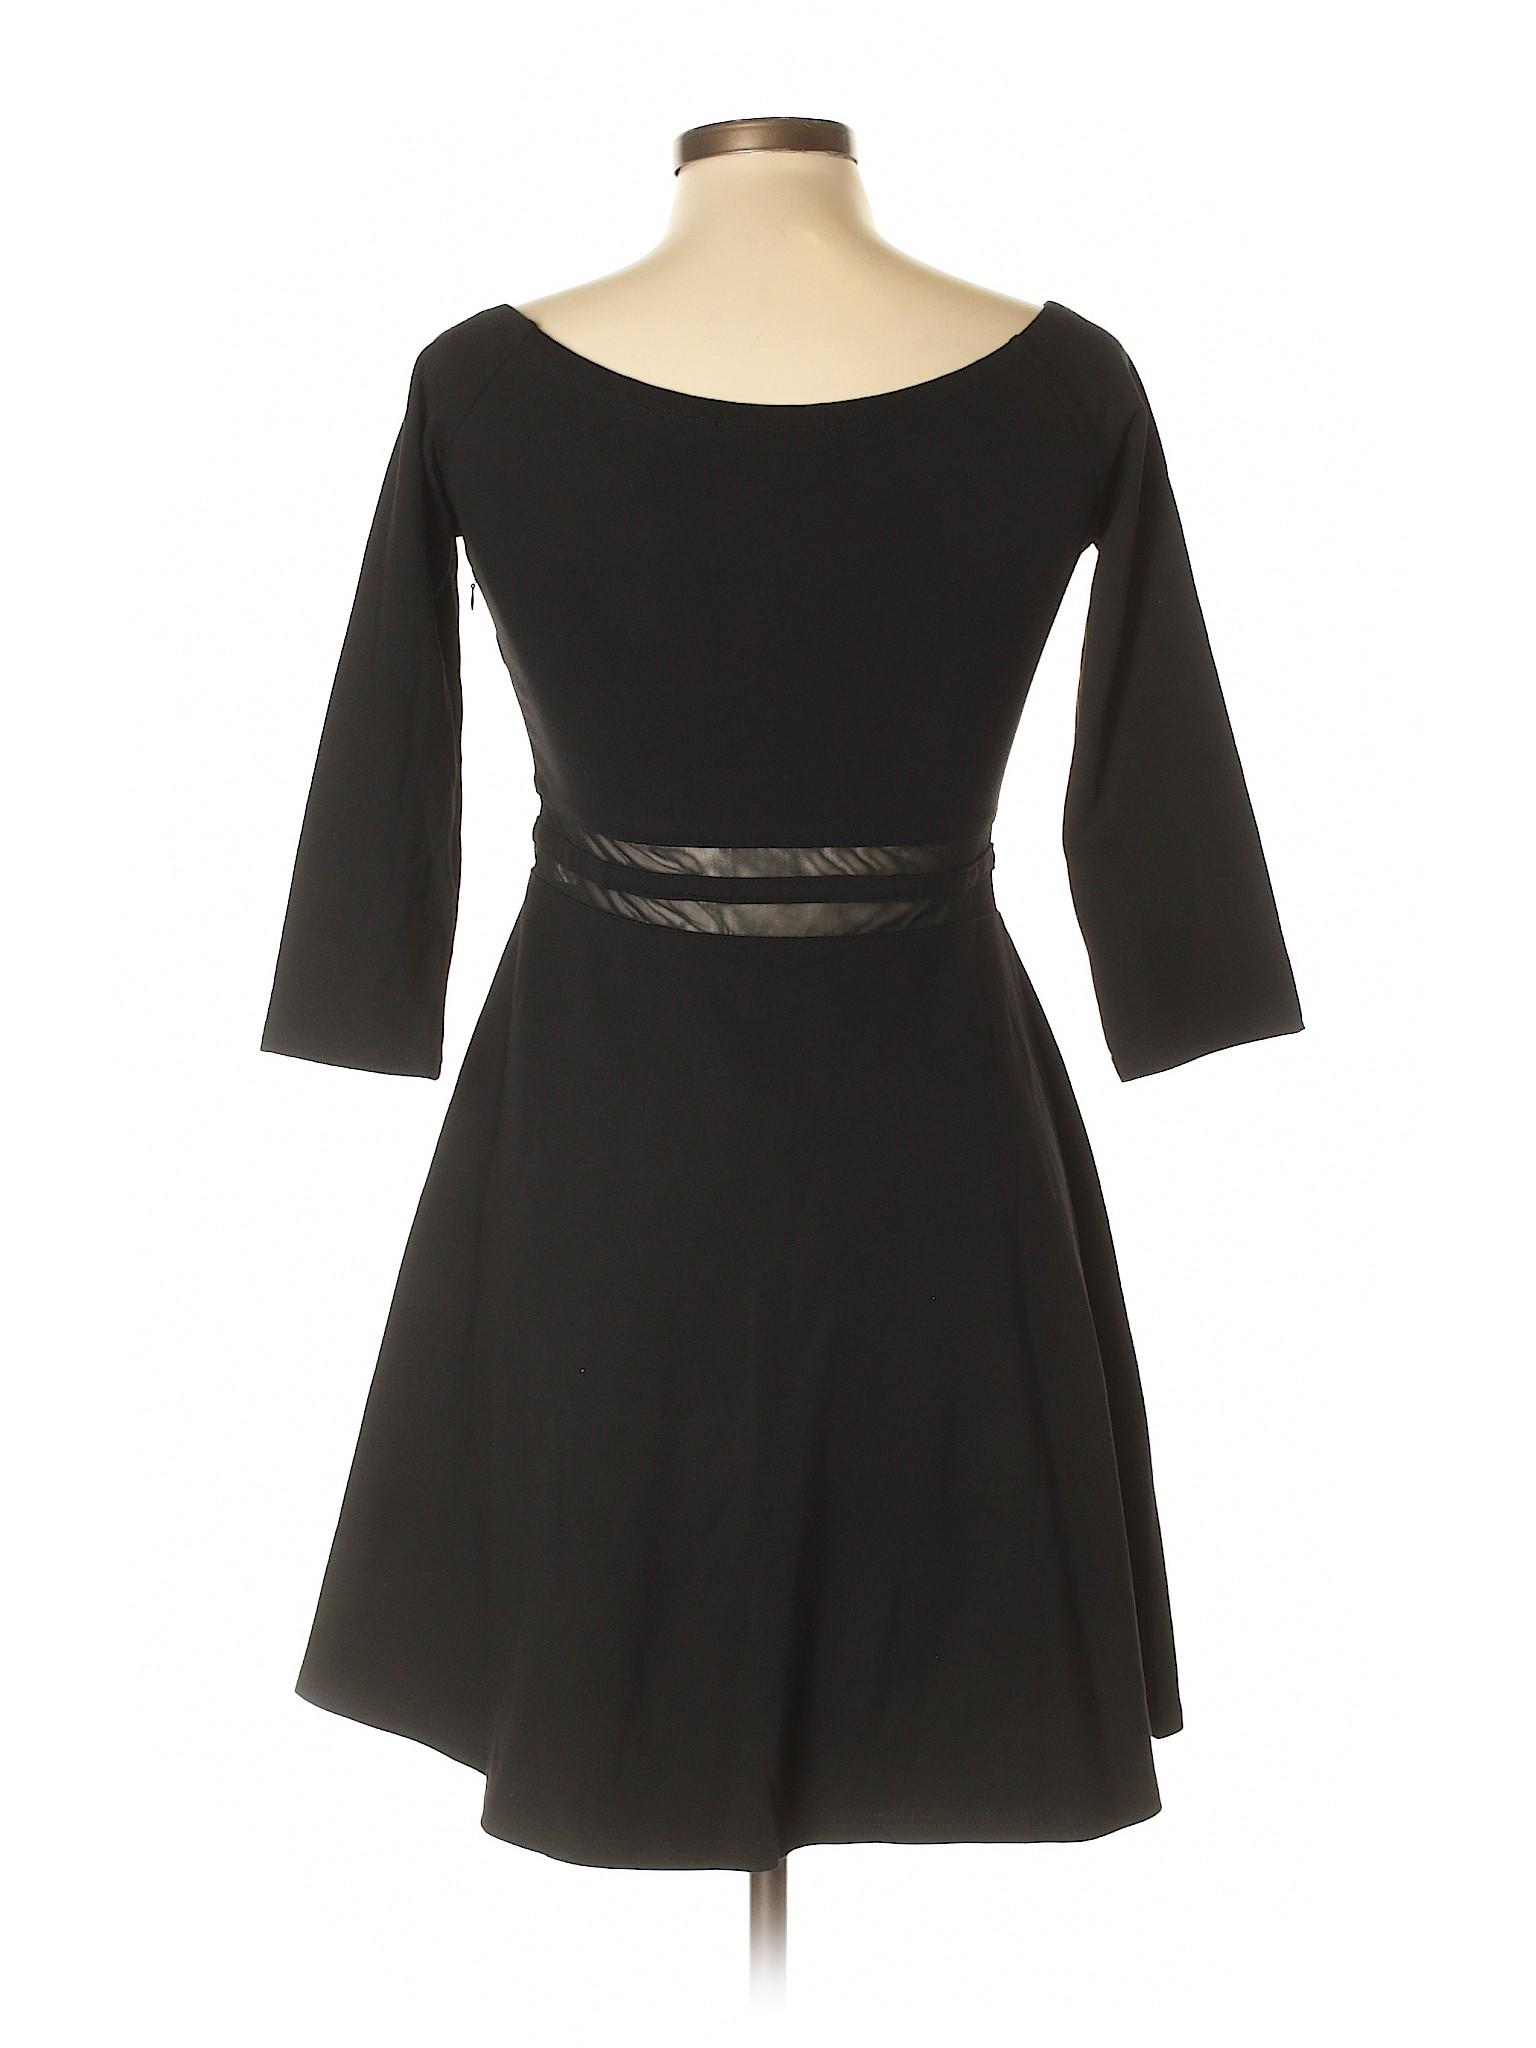 Casual Lulu's Lulu's Casual Selling Dress Selling Casual Dress Lulu's Lulu's Casual Dress Dress Lulu's Selling Selling Selling dXFqfX